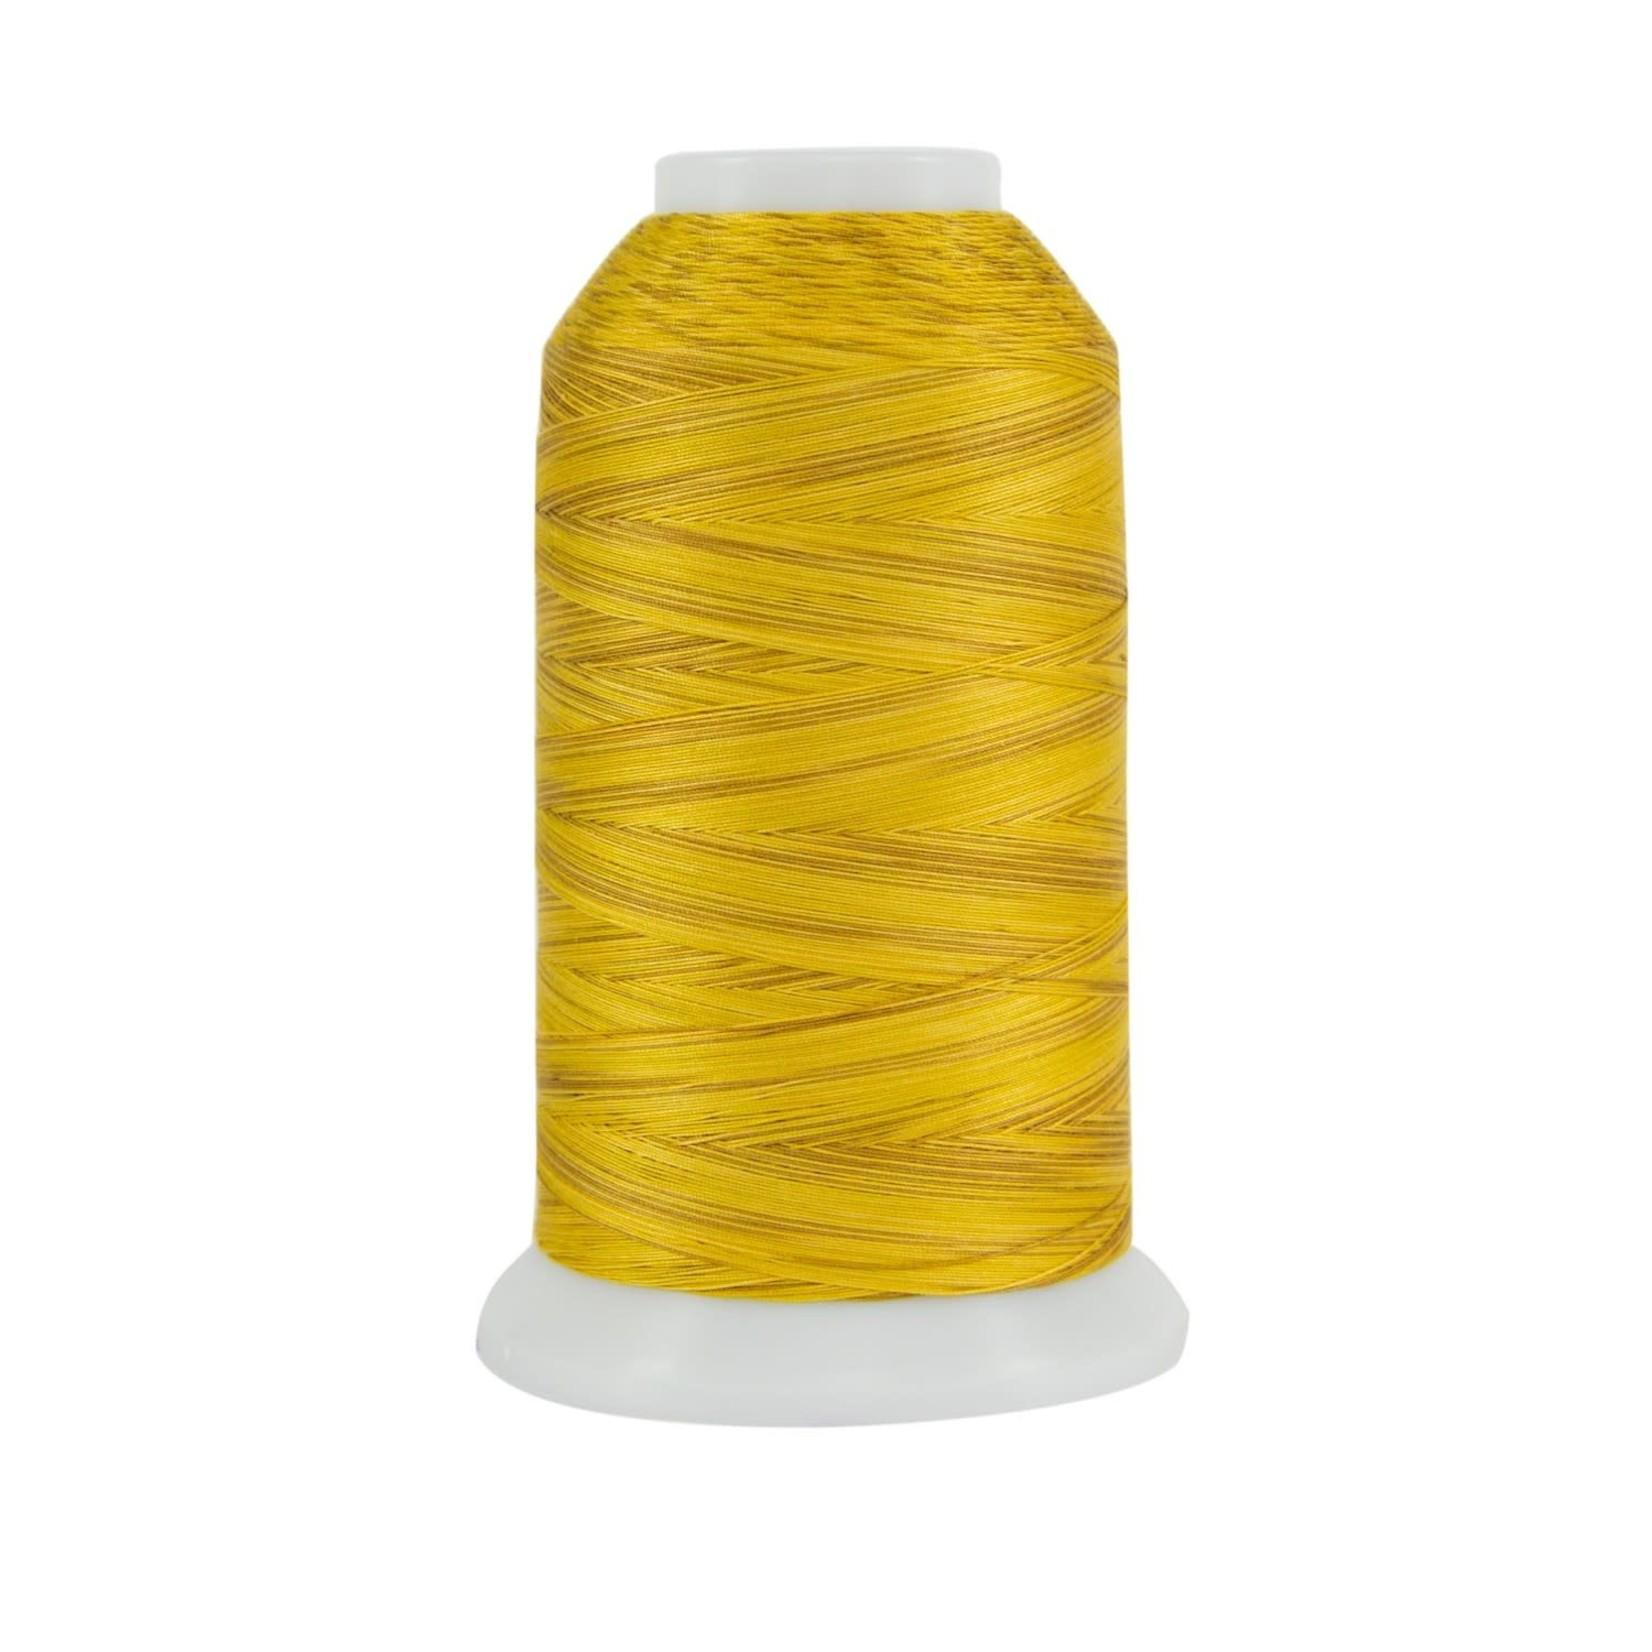 Superior Threads King Tut - #40 - 1828 m - 0955 Sunflowers